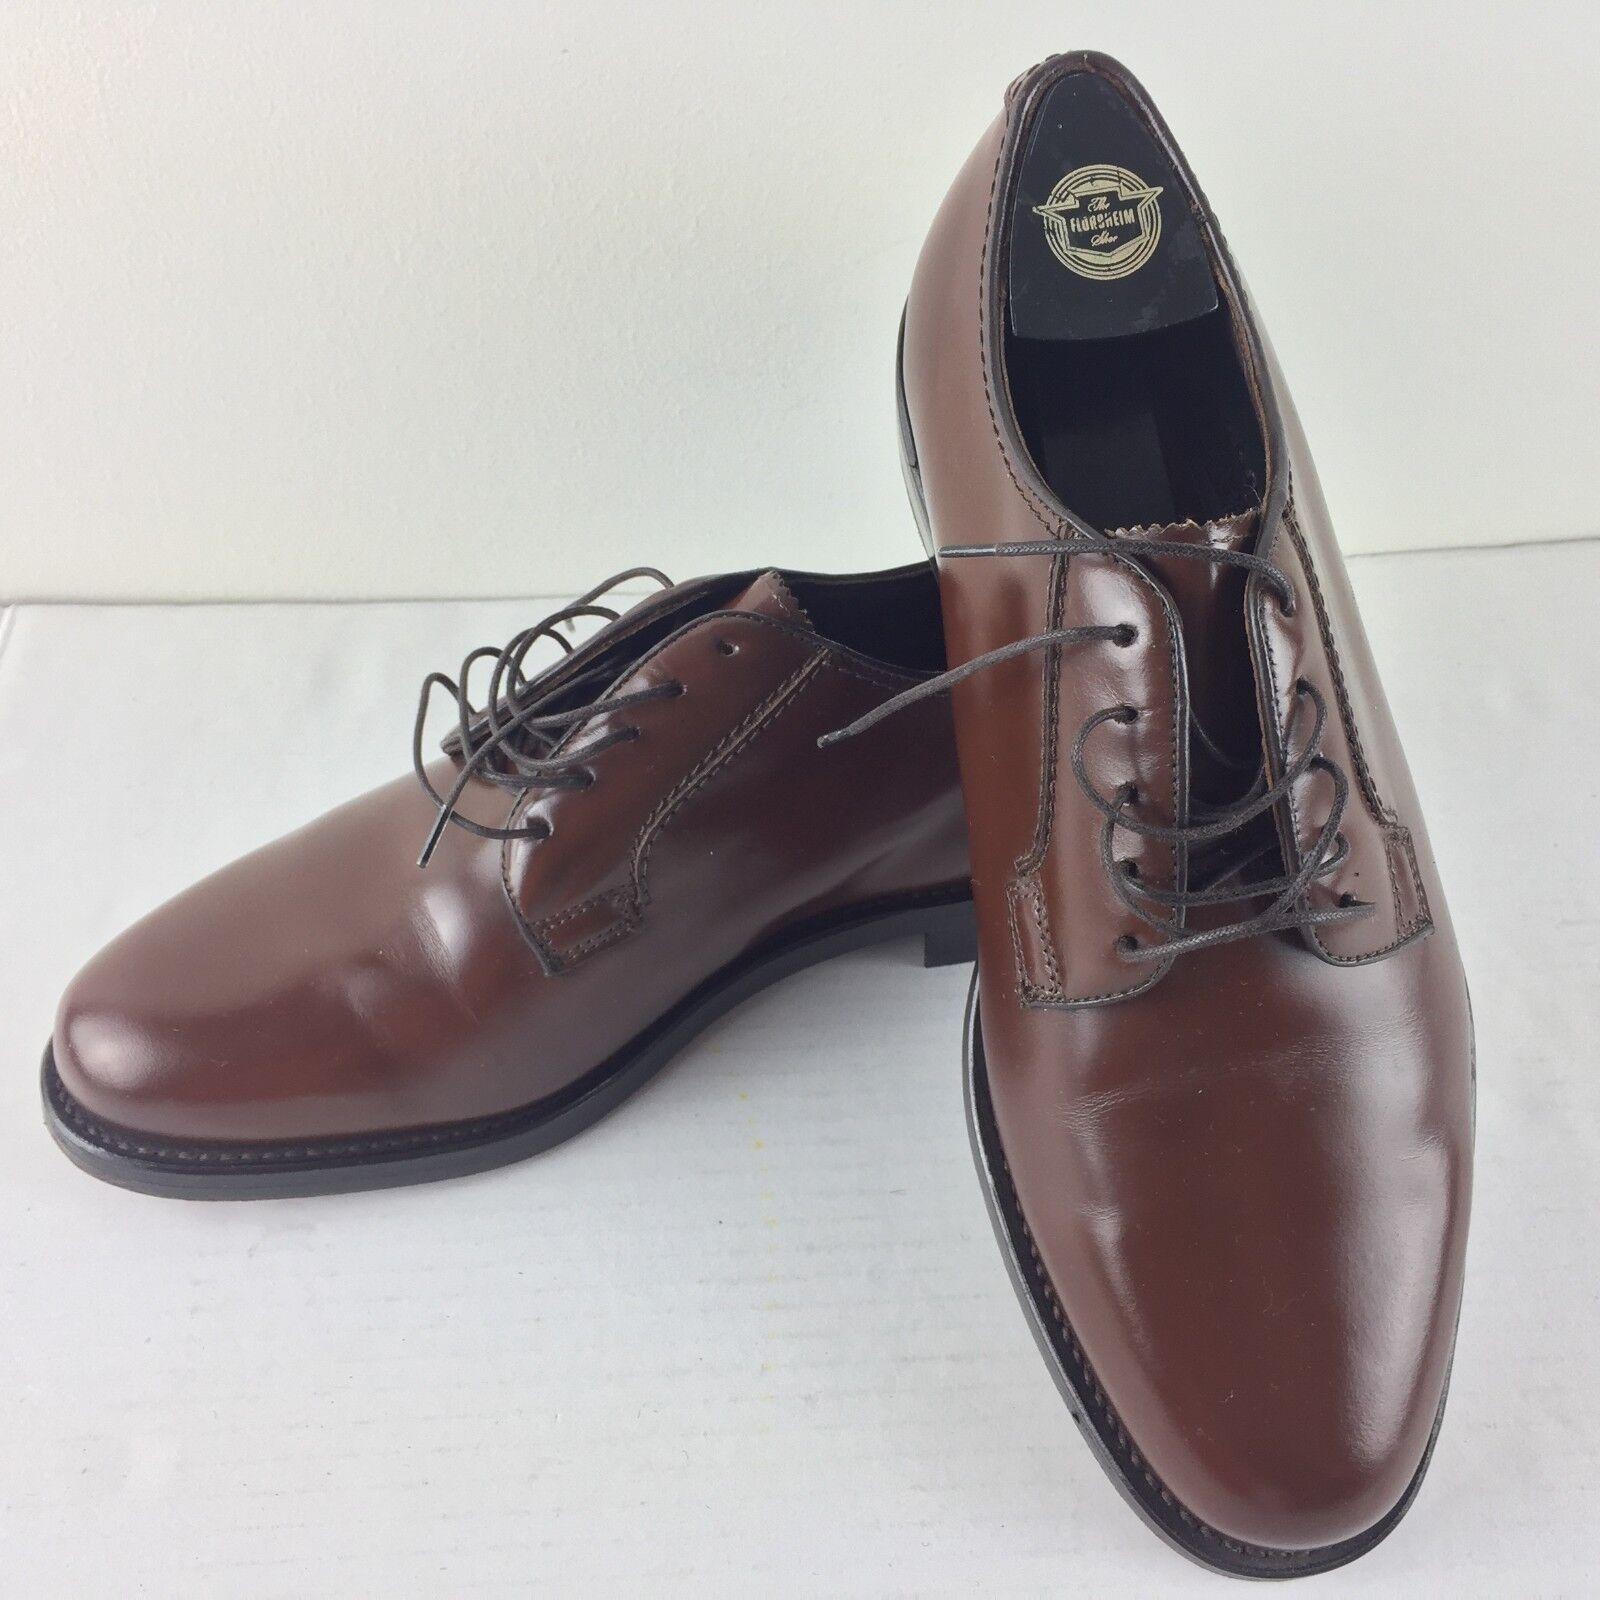 Florsheim shoes 7 3E Brown Plain Toe bluecher 11582